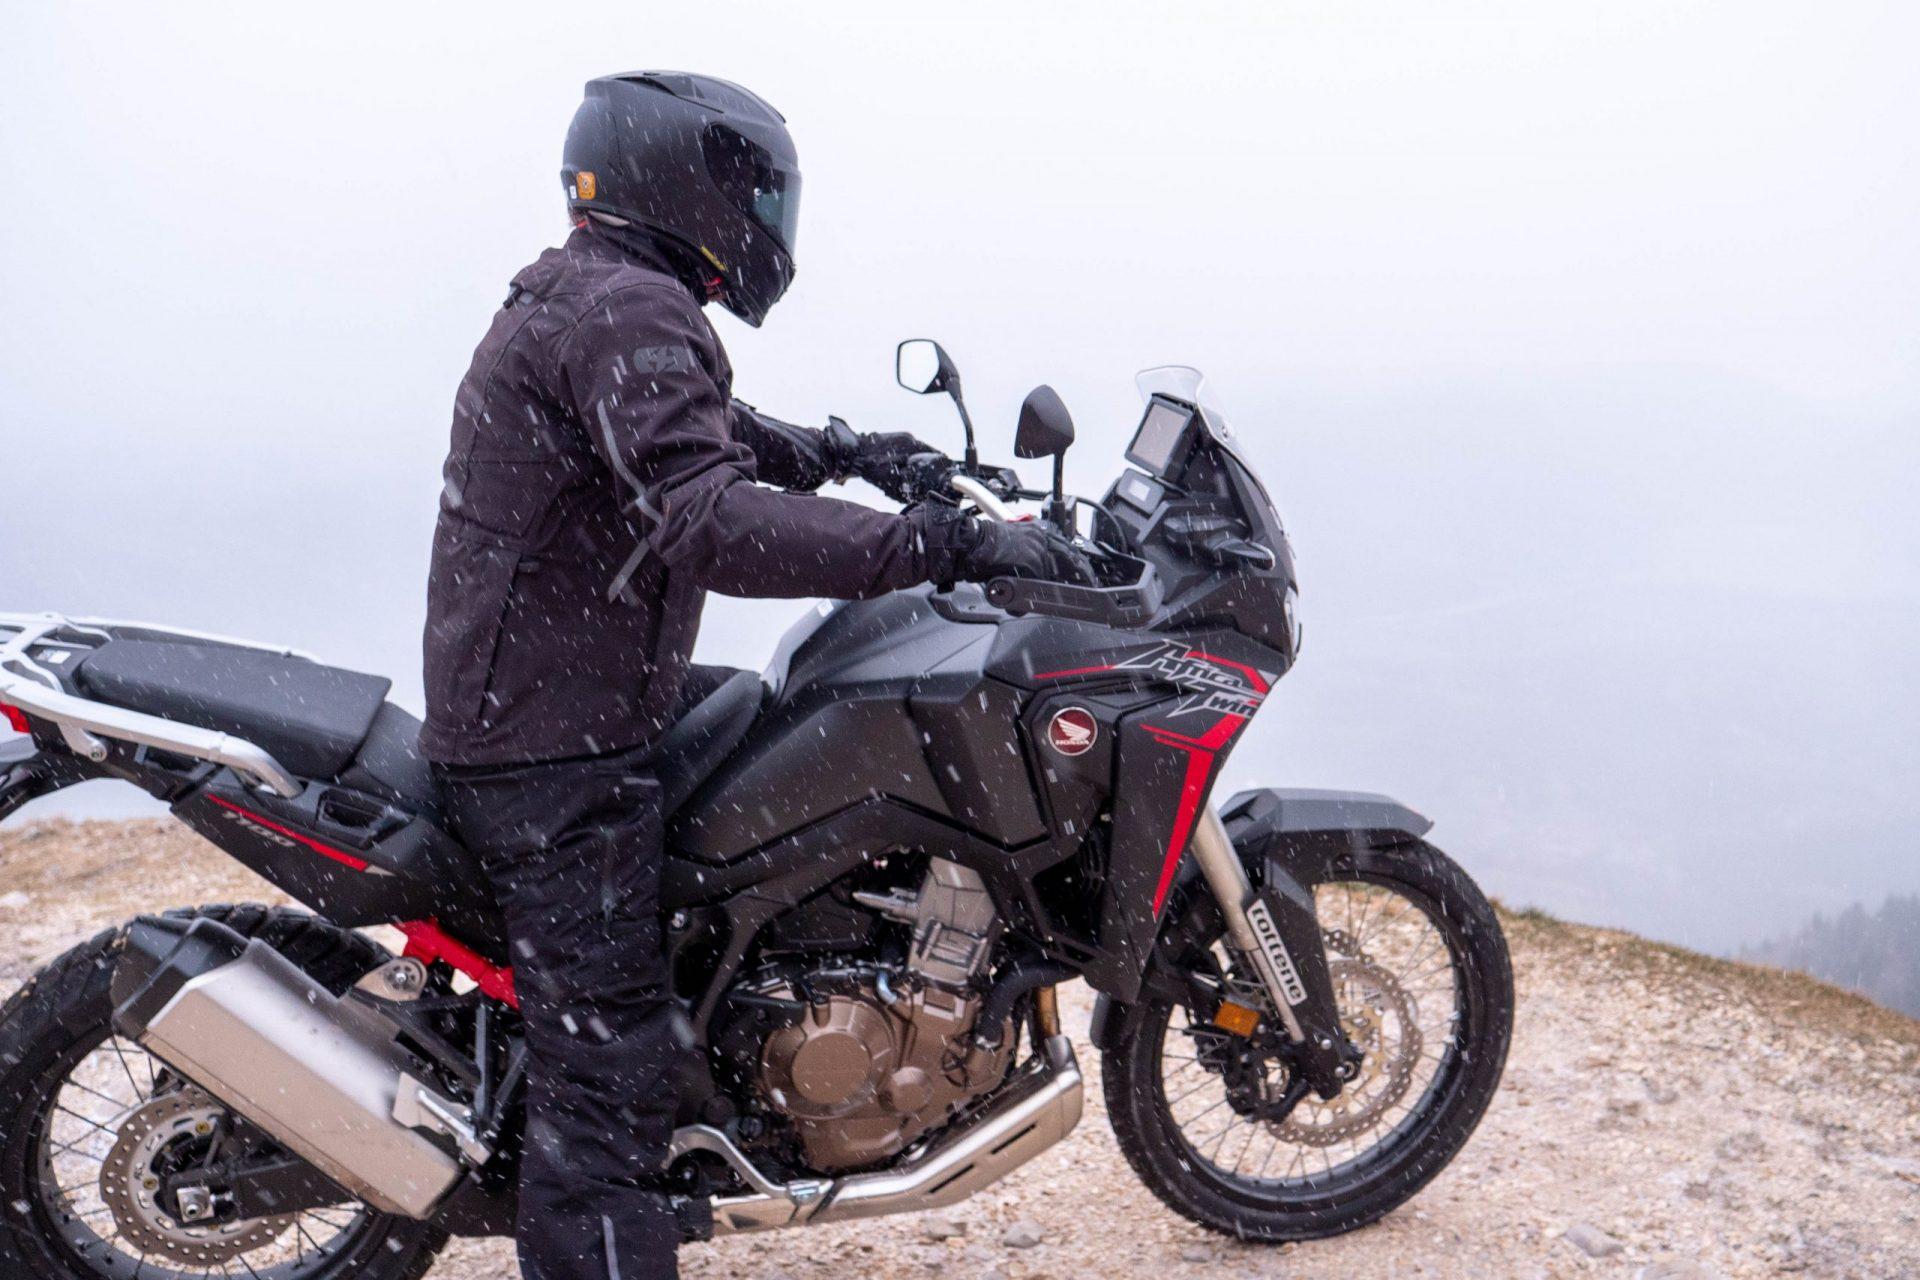 P1088694-scaled Advanced Riderwear